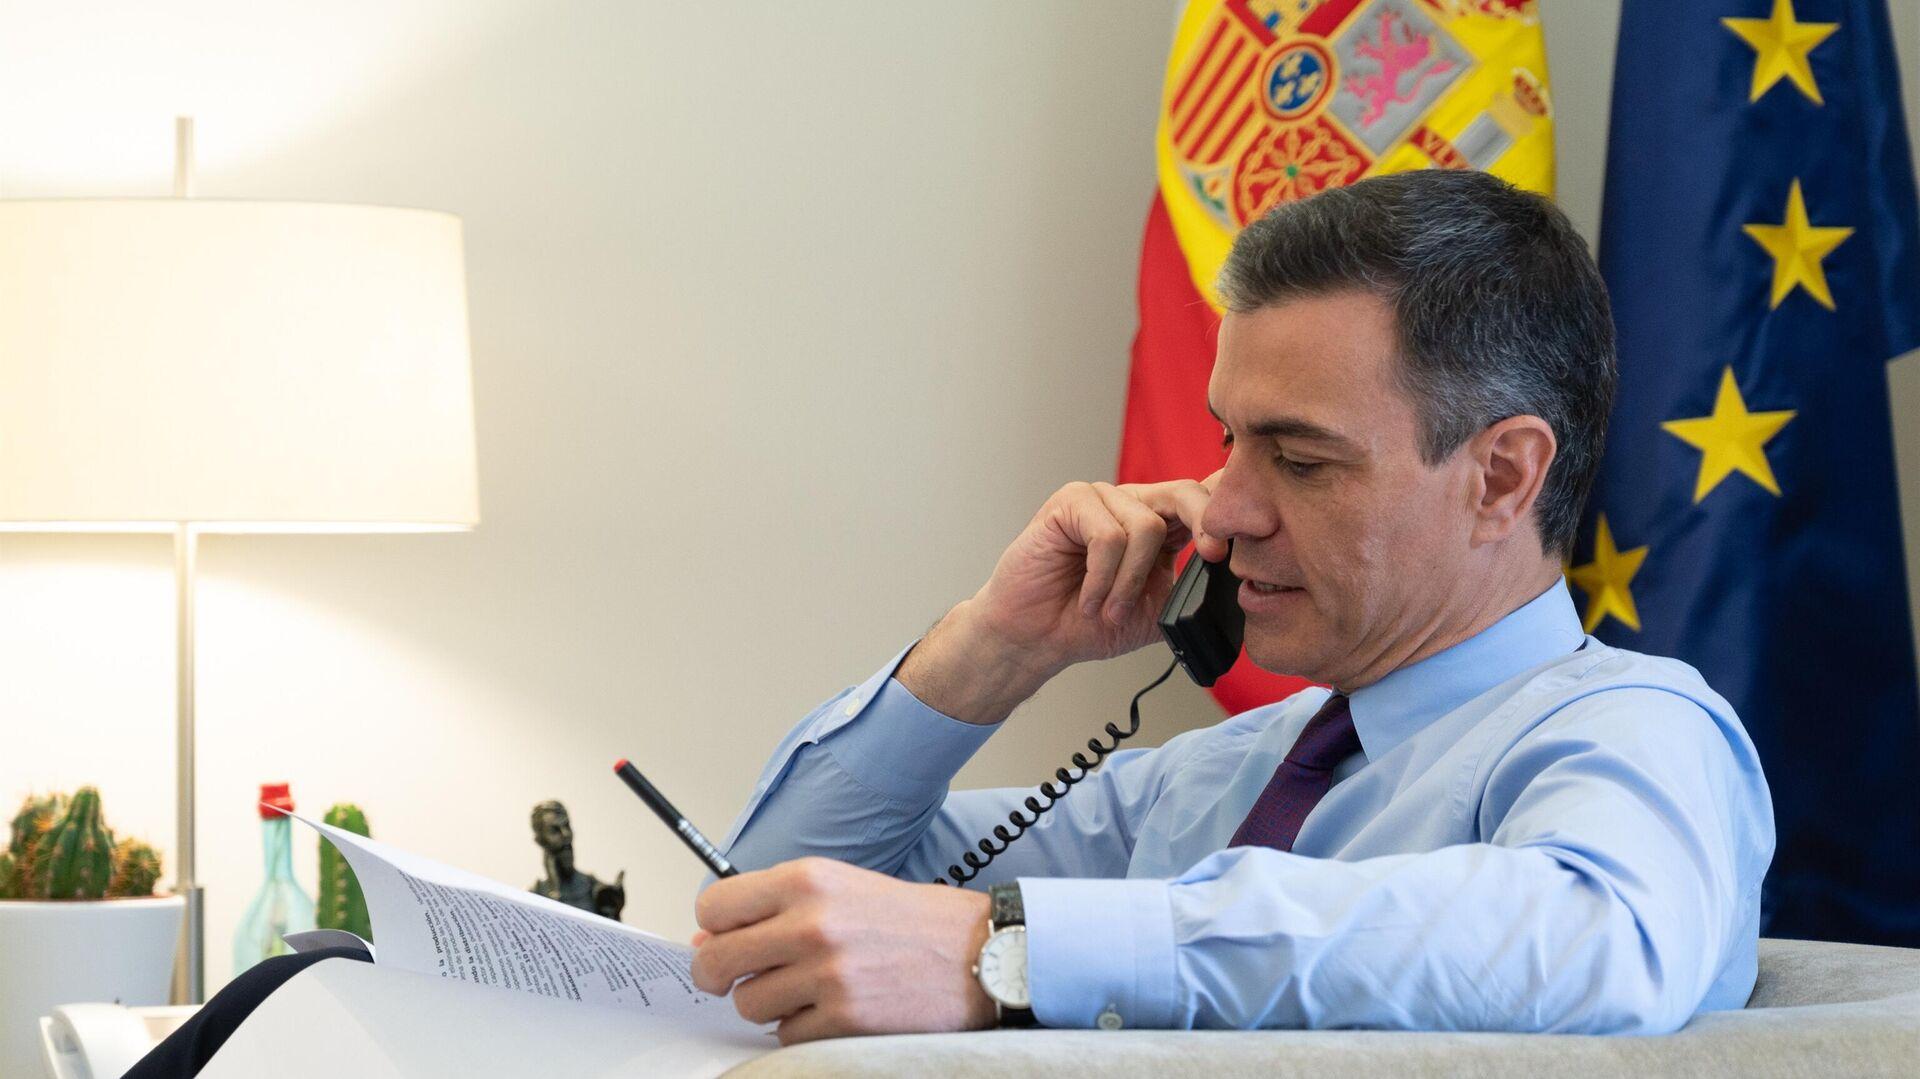 El presidente del Gobierno español, Pedro Sánchez, habla por teléfono - Sputnik Mundo, 1920, 26.05.2021